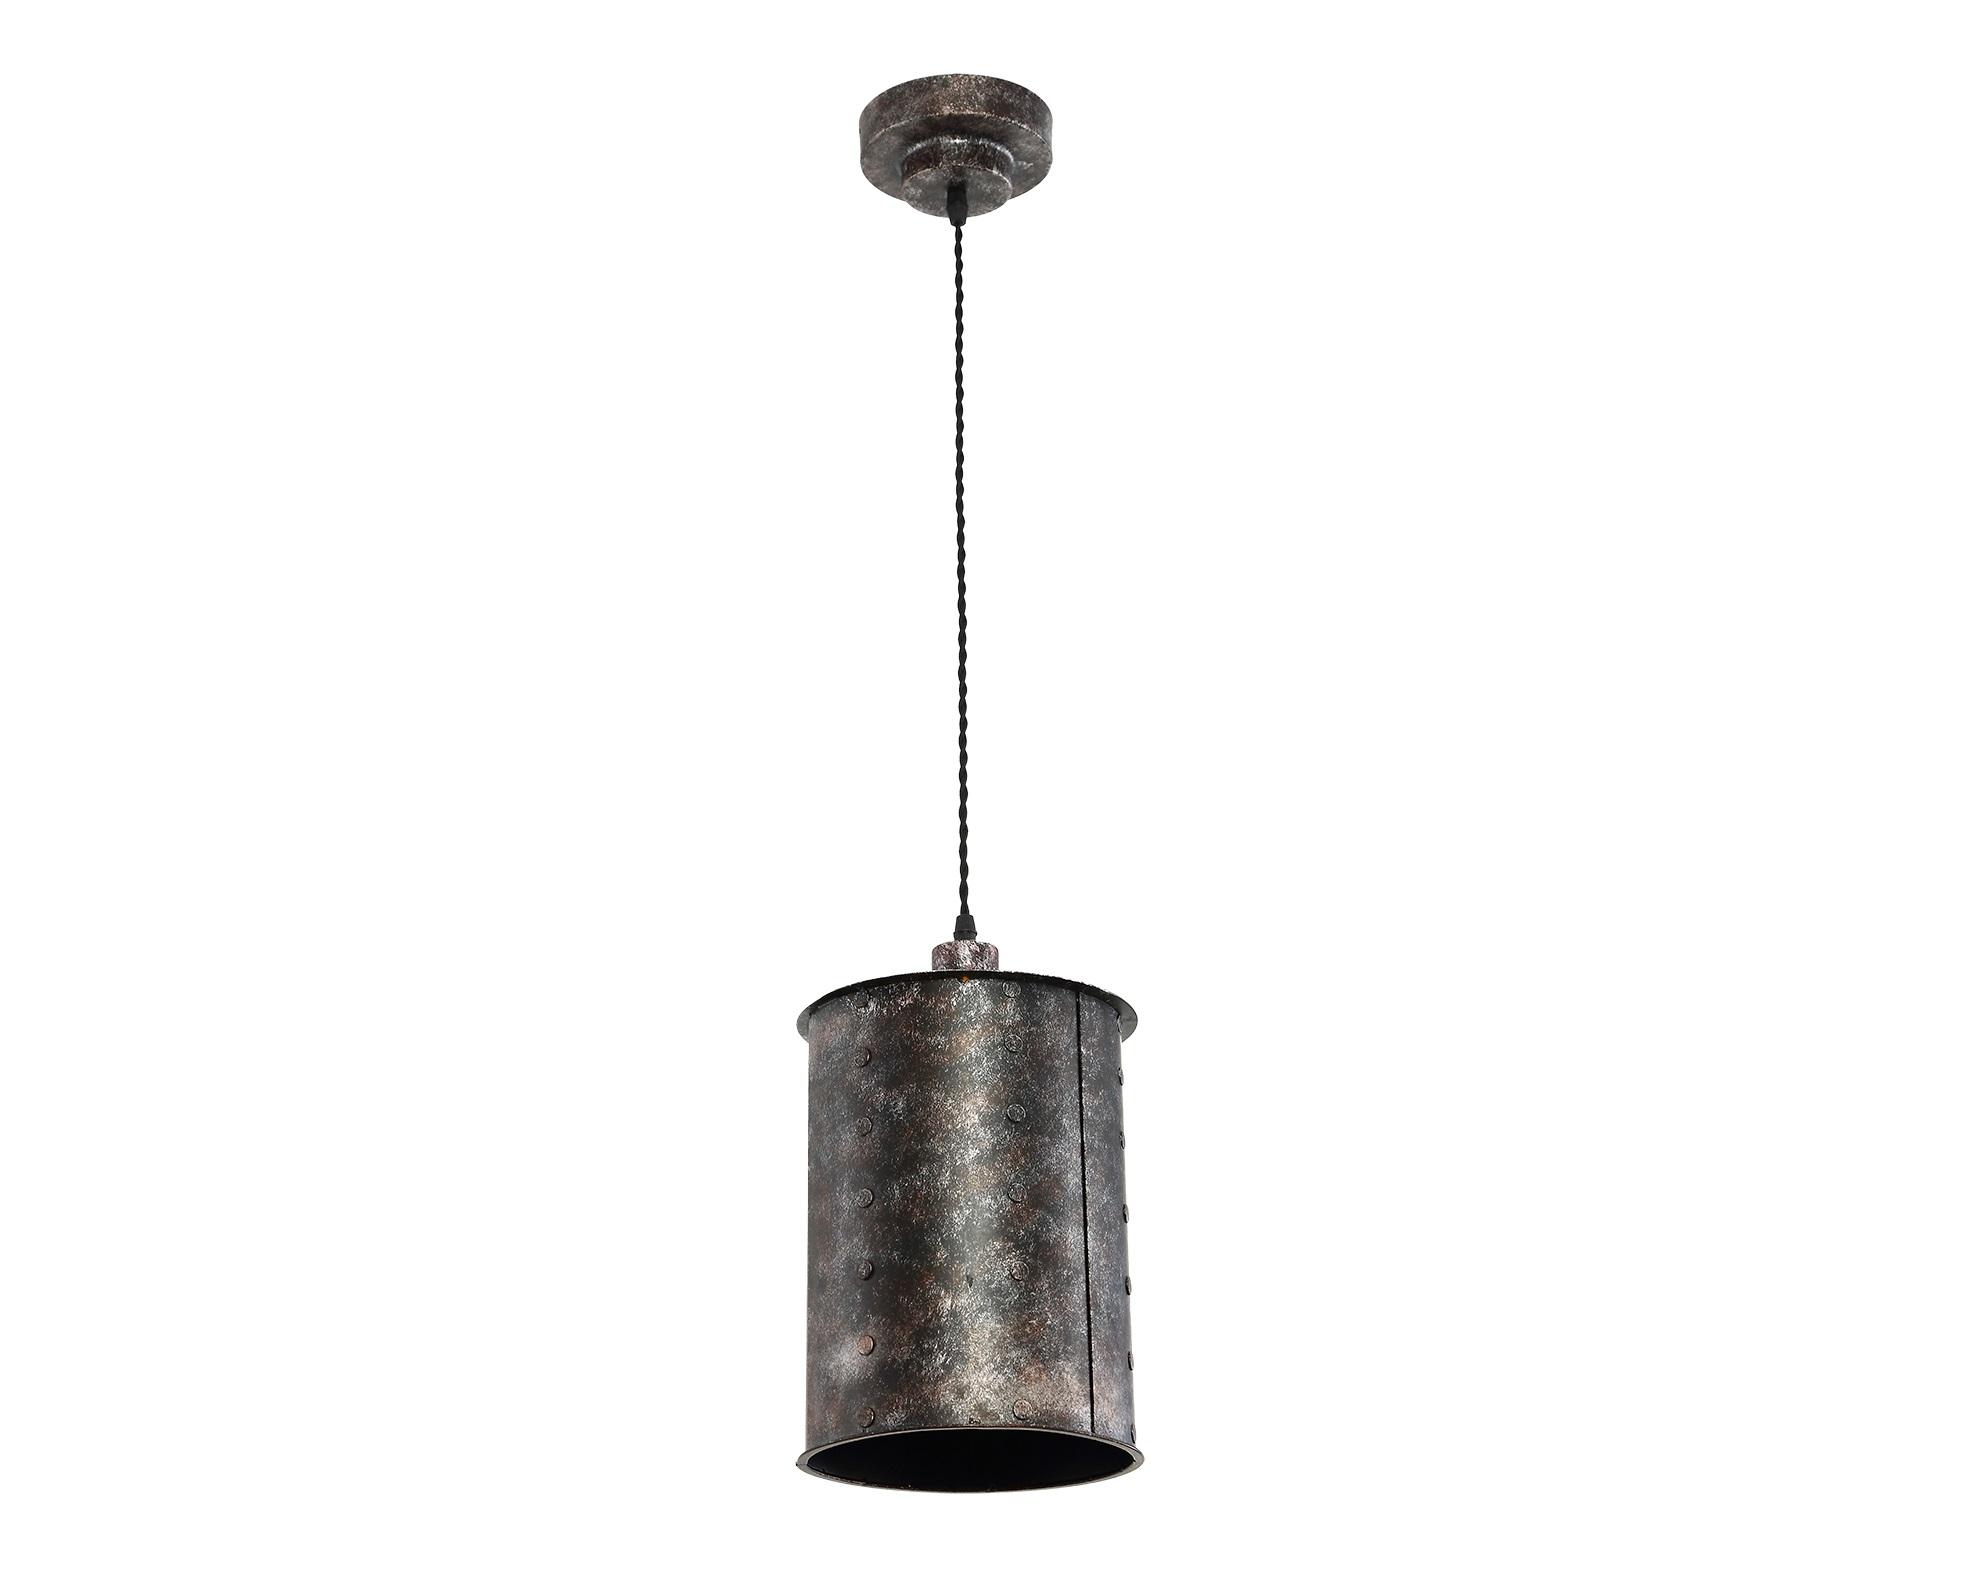 Подвесной светильникПодвесные светильники<br>&amp;lt;div&amp;gt;&amp;lt;div&amp;gt;Вид цоколя: E27&amp;lt;/div&amp;gt;&amp;lt;div&amp;gt;Мощность: 60W&amp;lt;/div&amp;gt;&amp;lt;div&amp;gt;Количество ламп: 1&amp;lt;/div&amp;gt;&amp;lt;div&amp;gt;Наличие ламп: отсутствуют.&amp;lt;/div&amp;gt;&amp;lt;/div&amp;gt;<br><br>Material: Металл<br>Width см: None<br>Height см: 120<br>Diameter см: 20